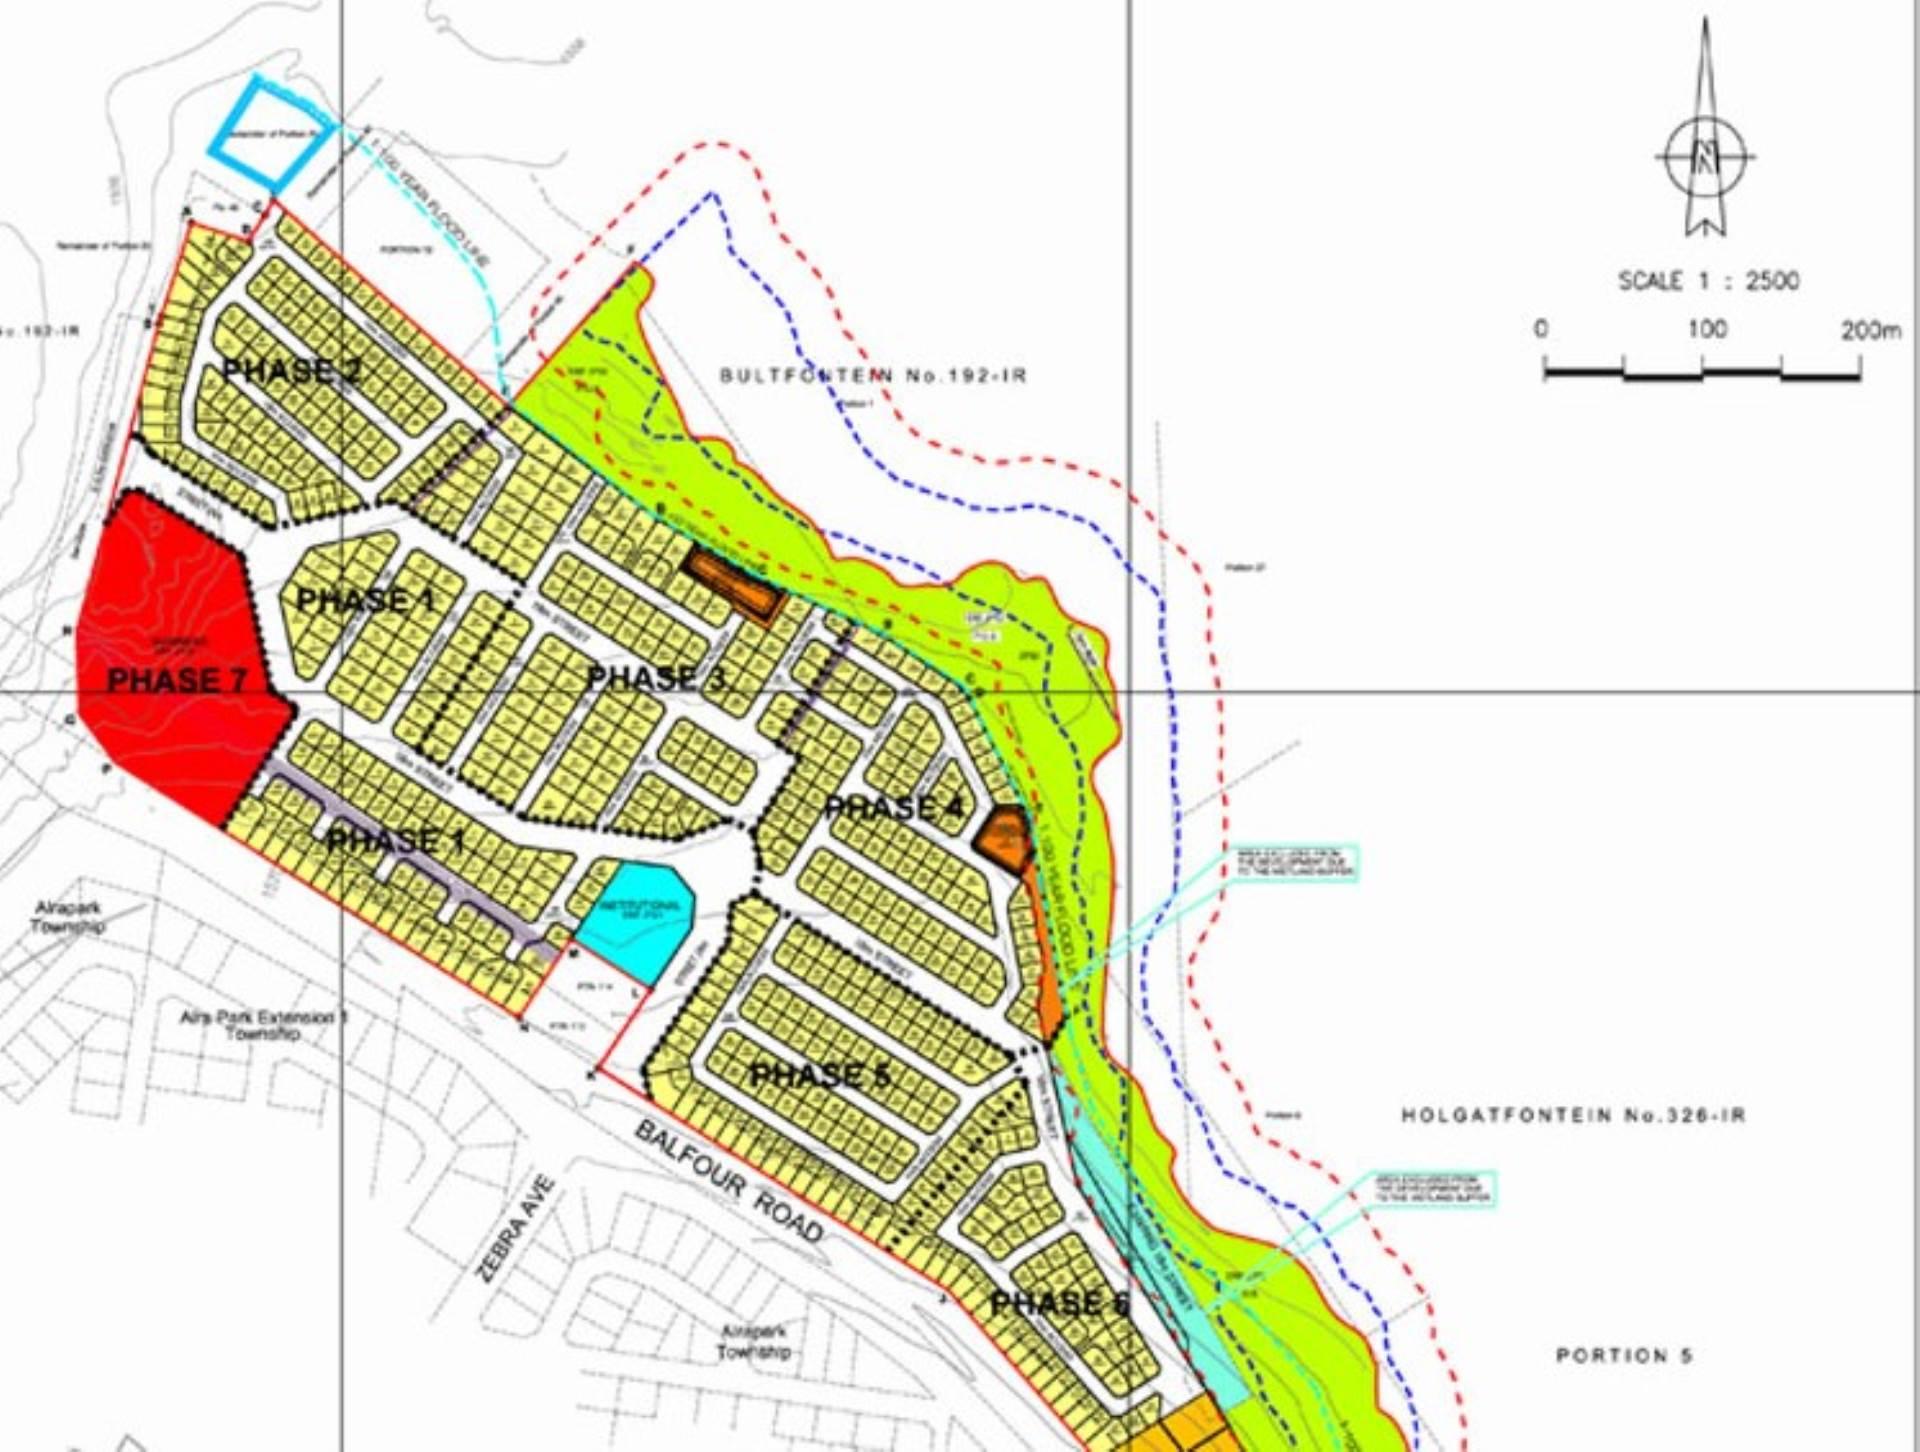 Vacant Land Residential For Sale In Alrapark, Nigel, Gauteng